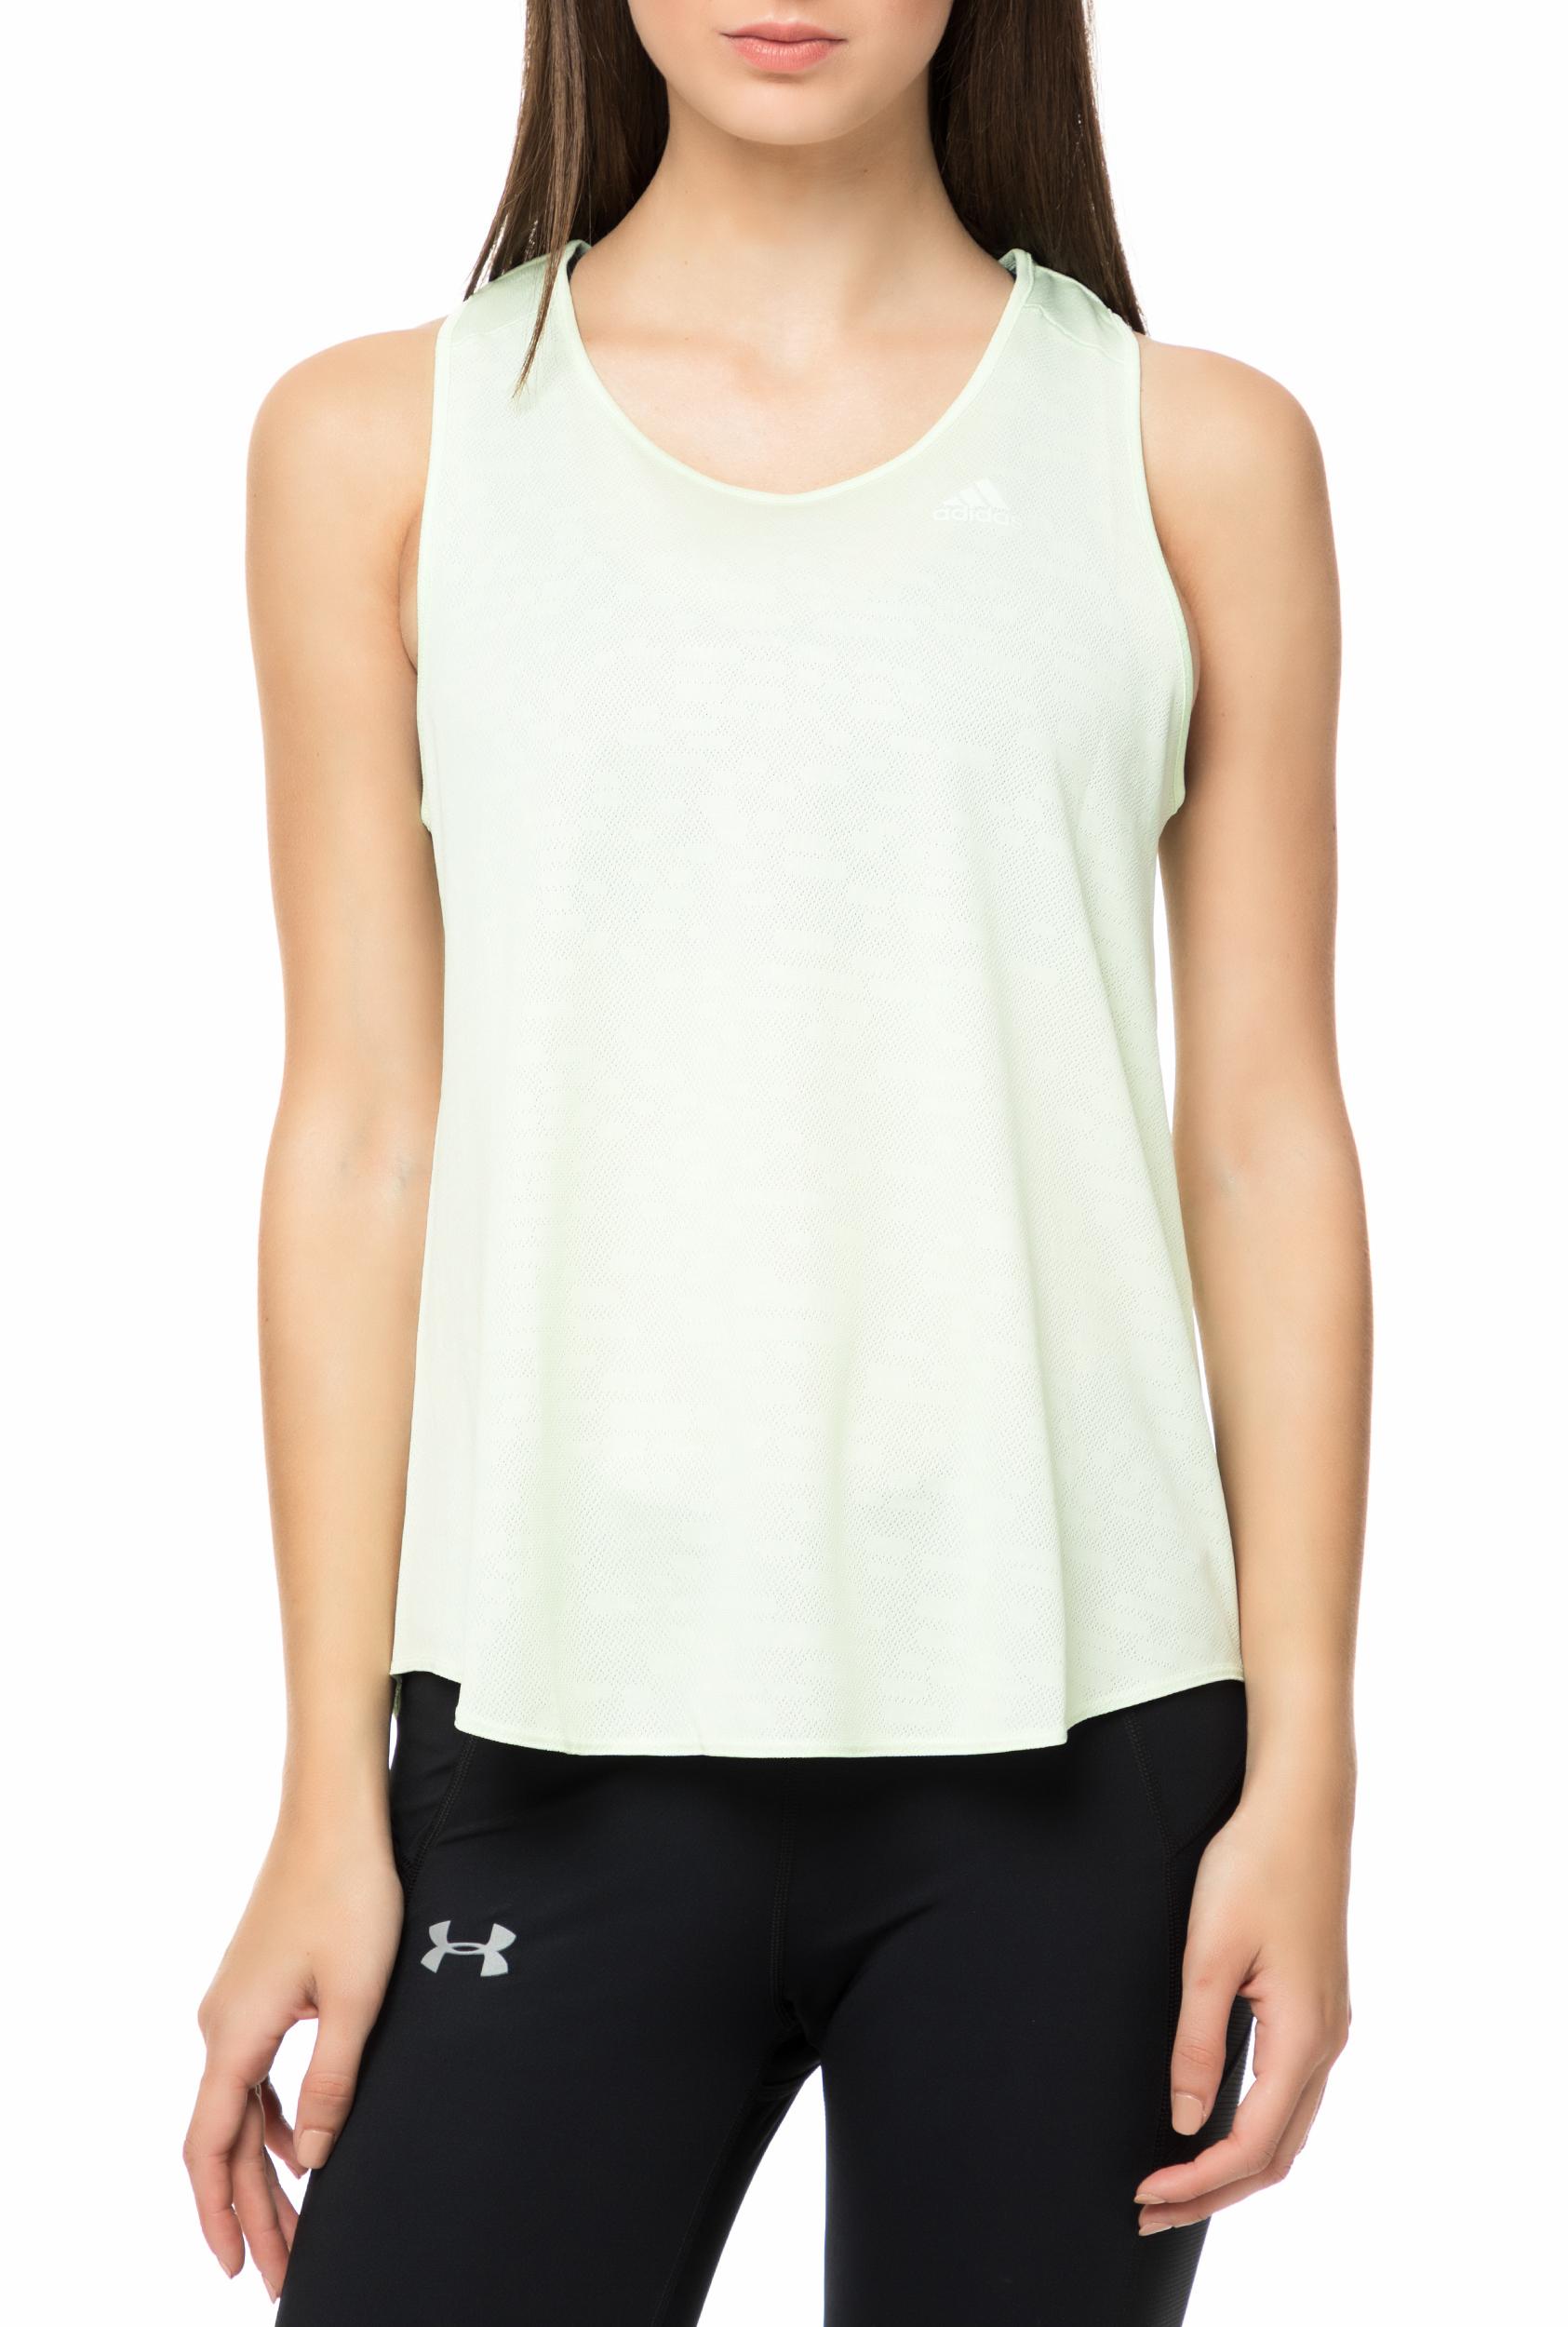 ADIDAS - Γυναικείες Αθλητικές Μπλούζες  f603a4de11c